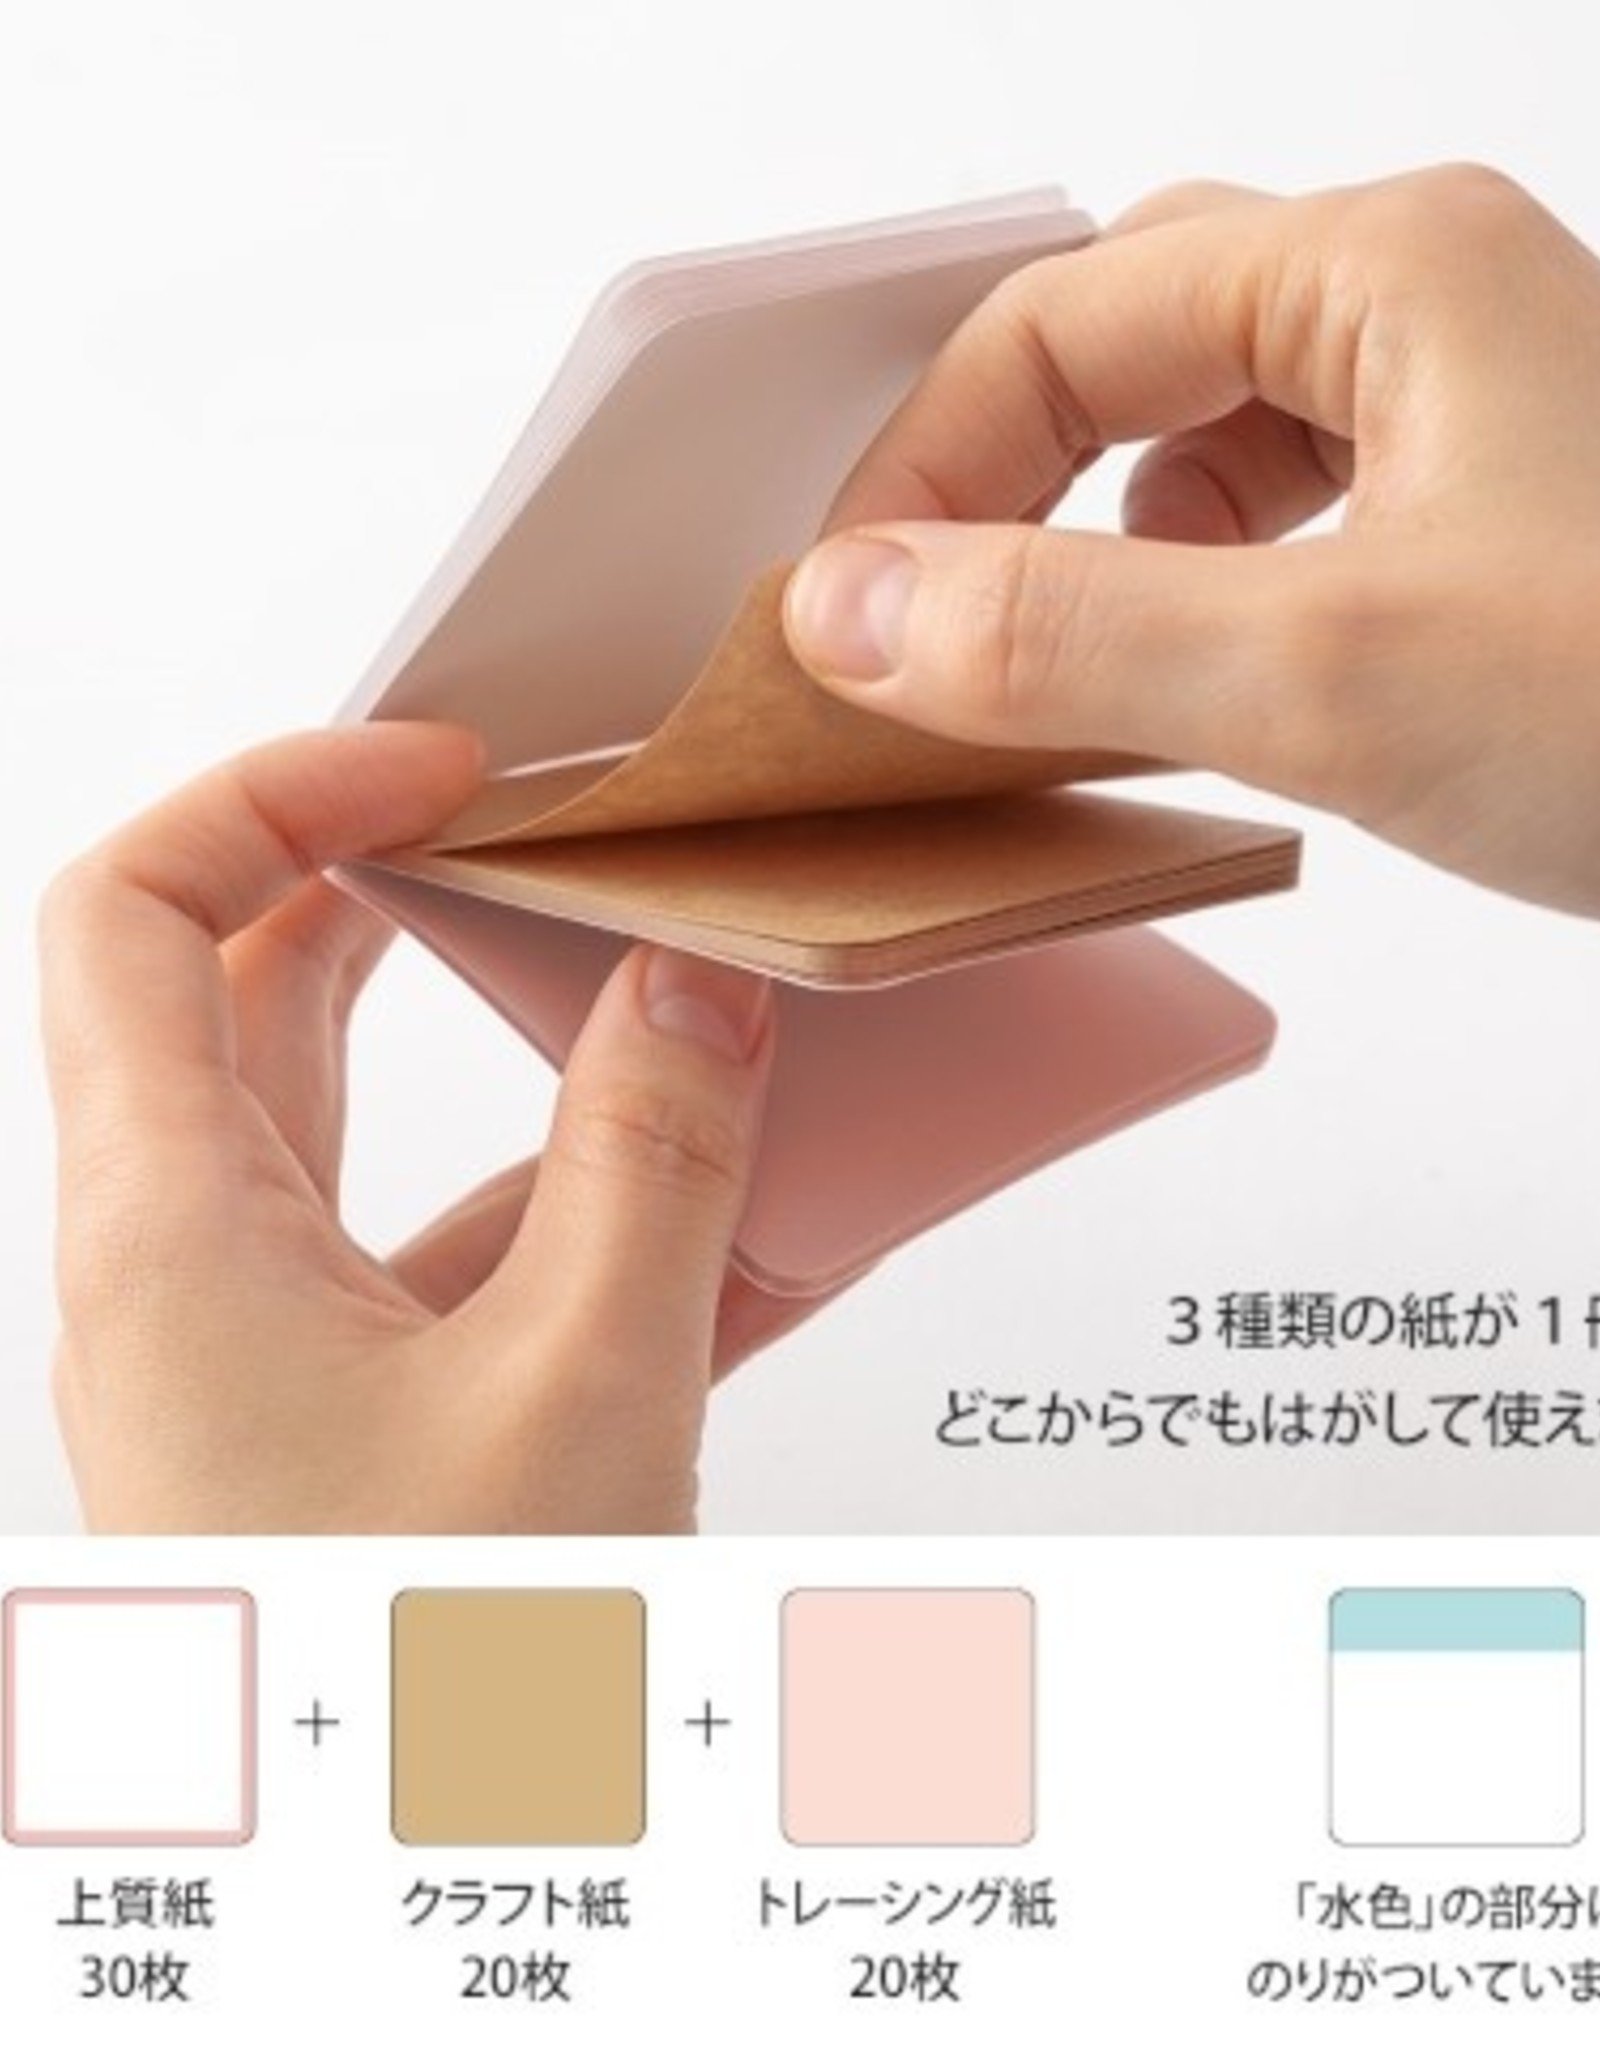 Midori Sticky Notes Pickable